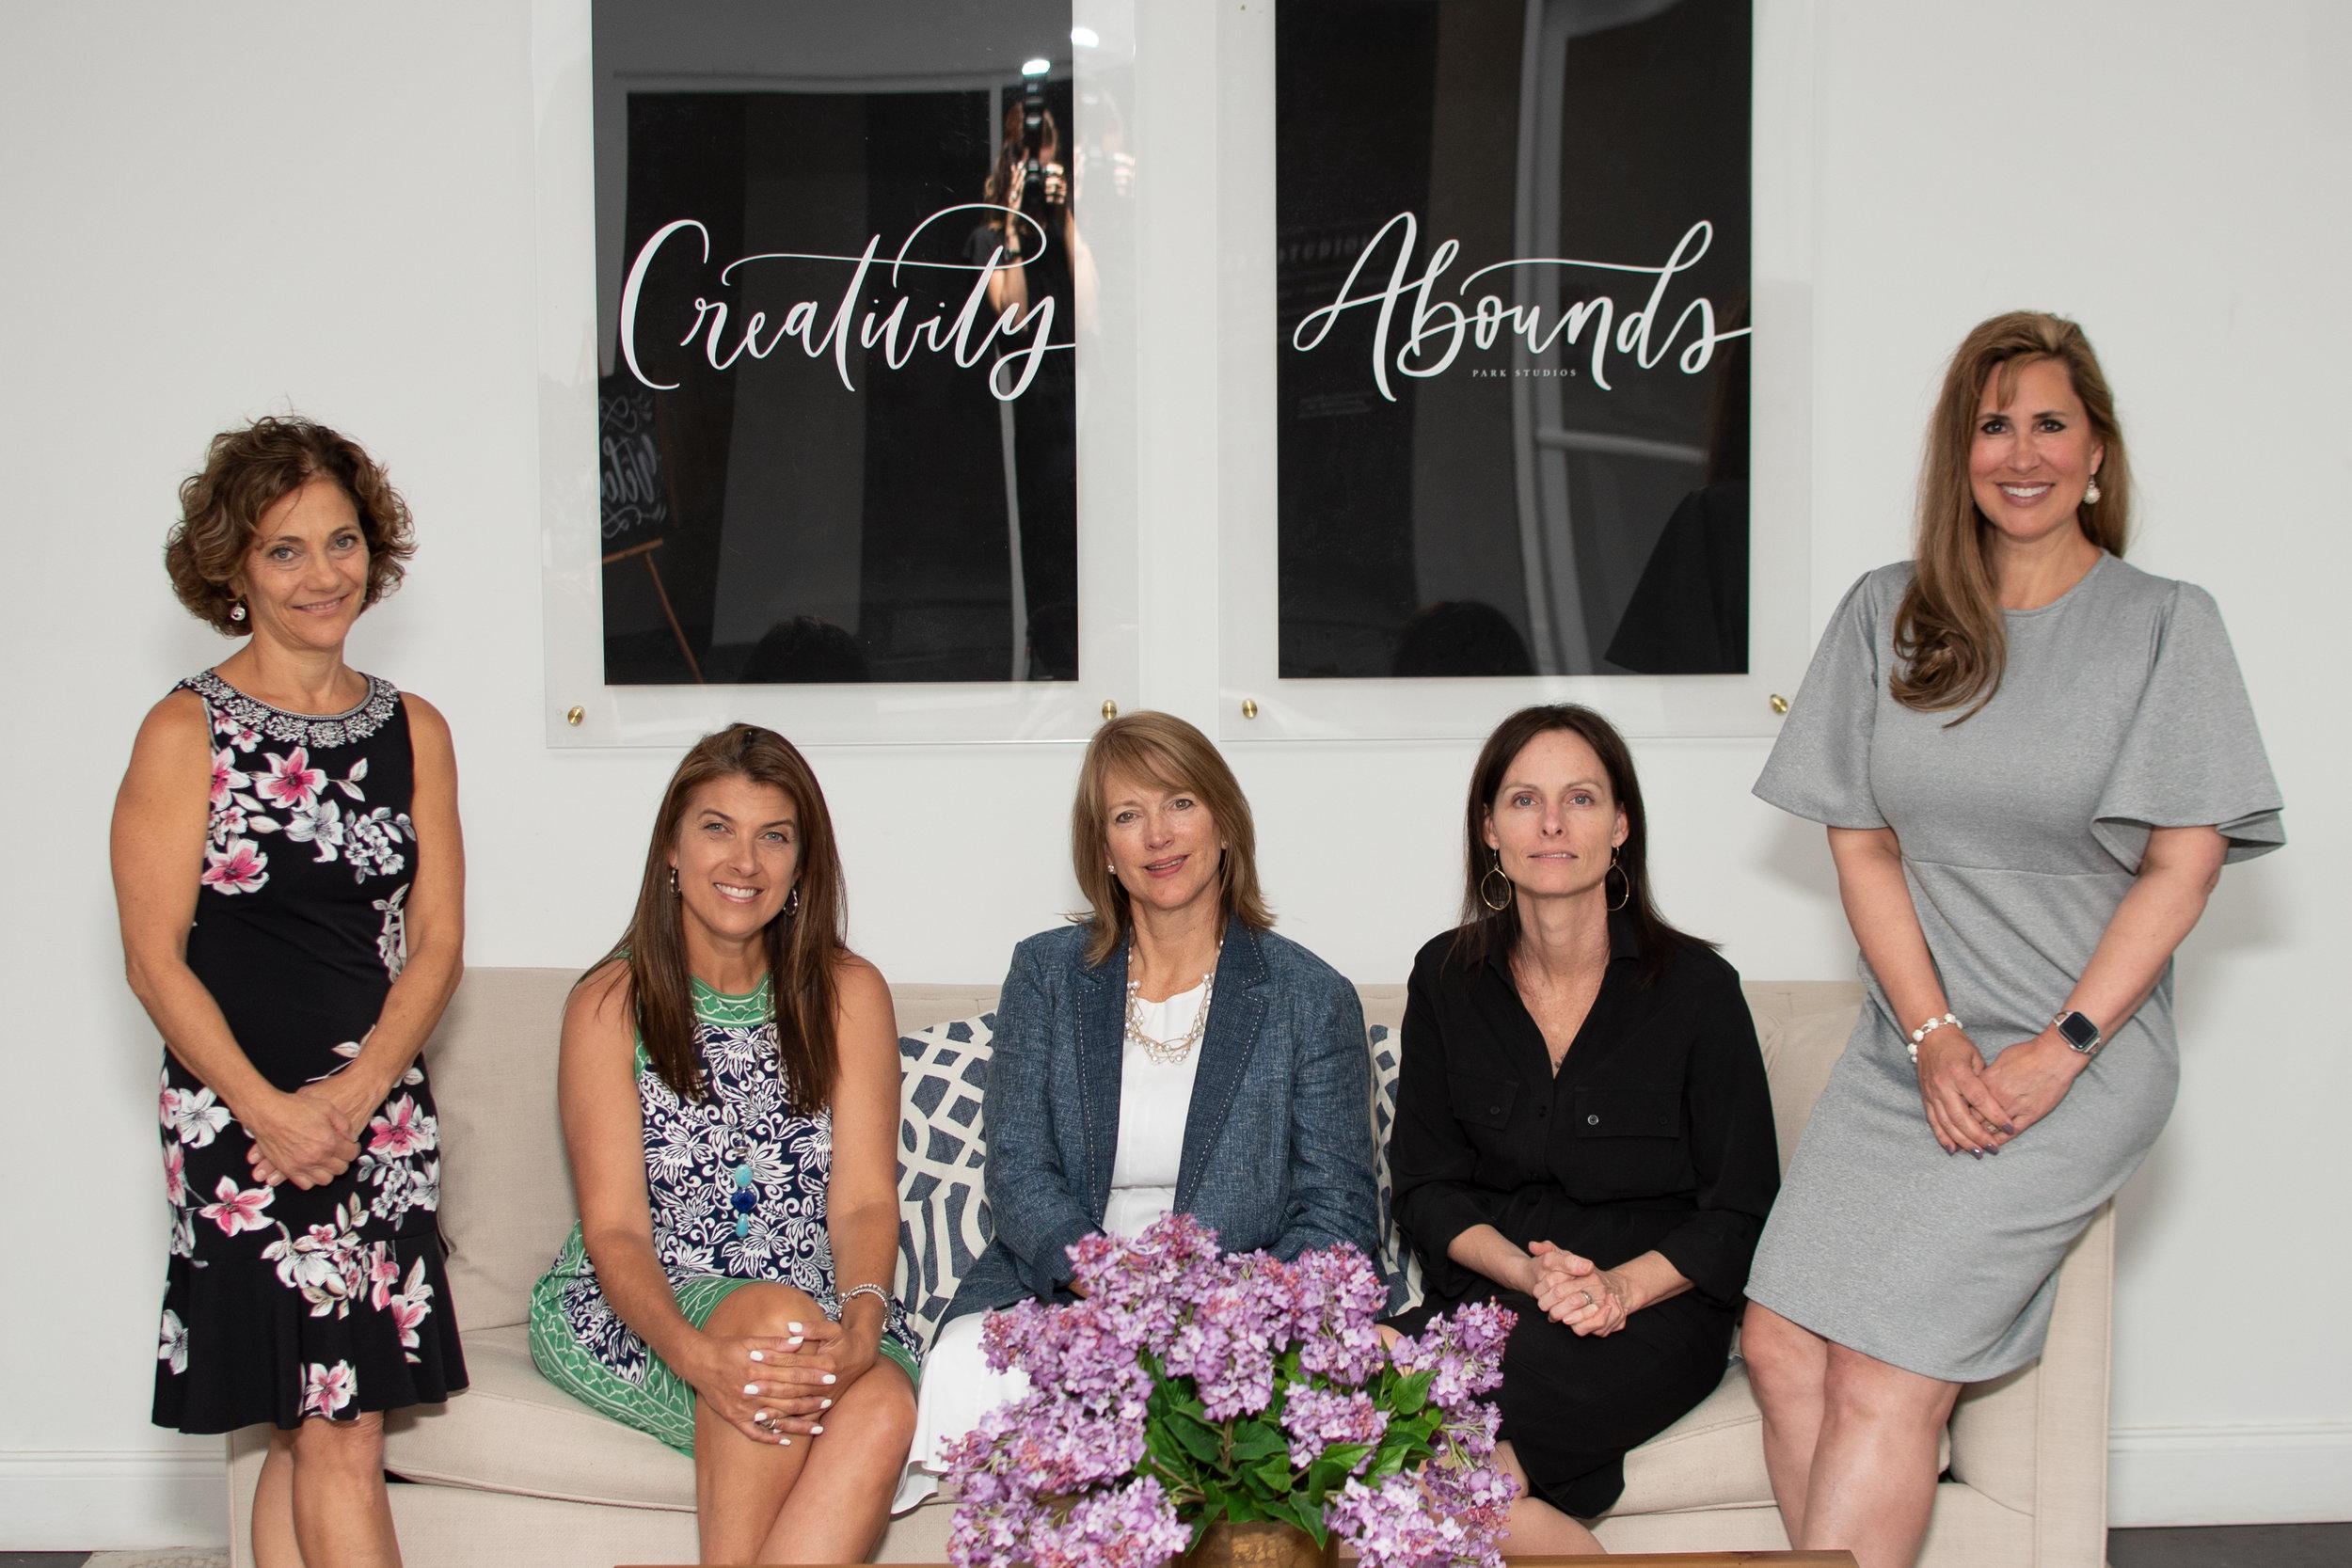 Pictured from left to right: Nina Shih, Michelle Merrill, Kaye Ginsberg, Susan Matray and Jennifer Johnston. Photo credit: Ericka Hamner